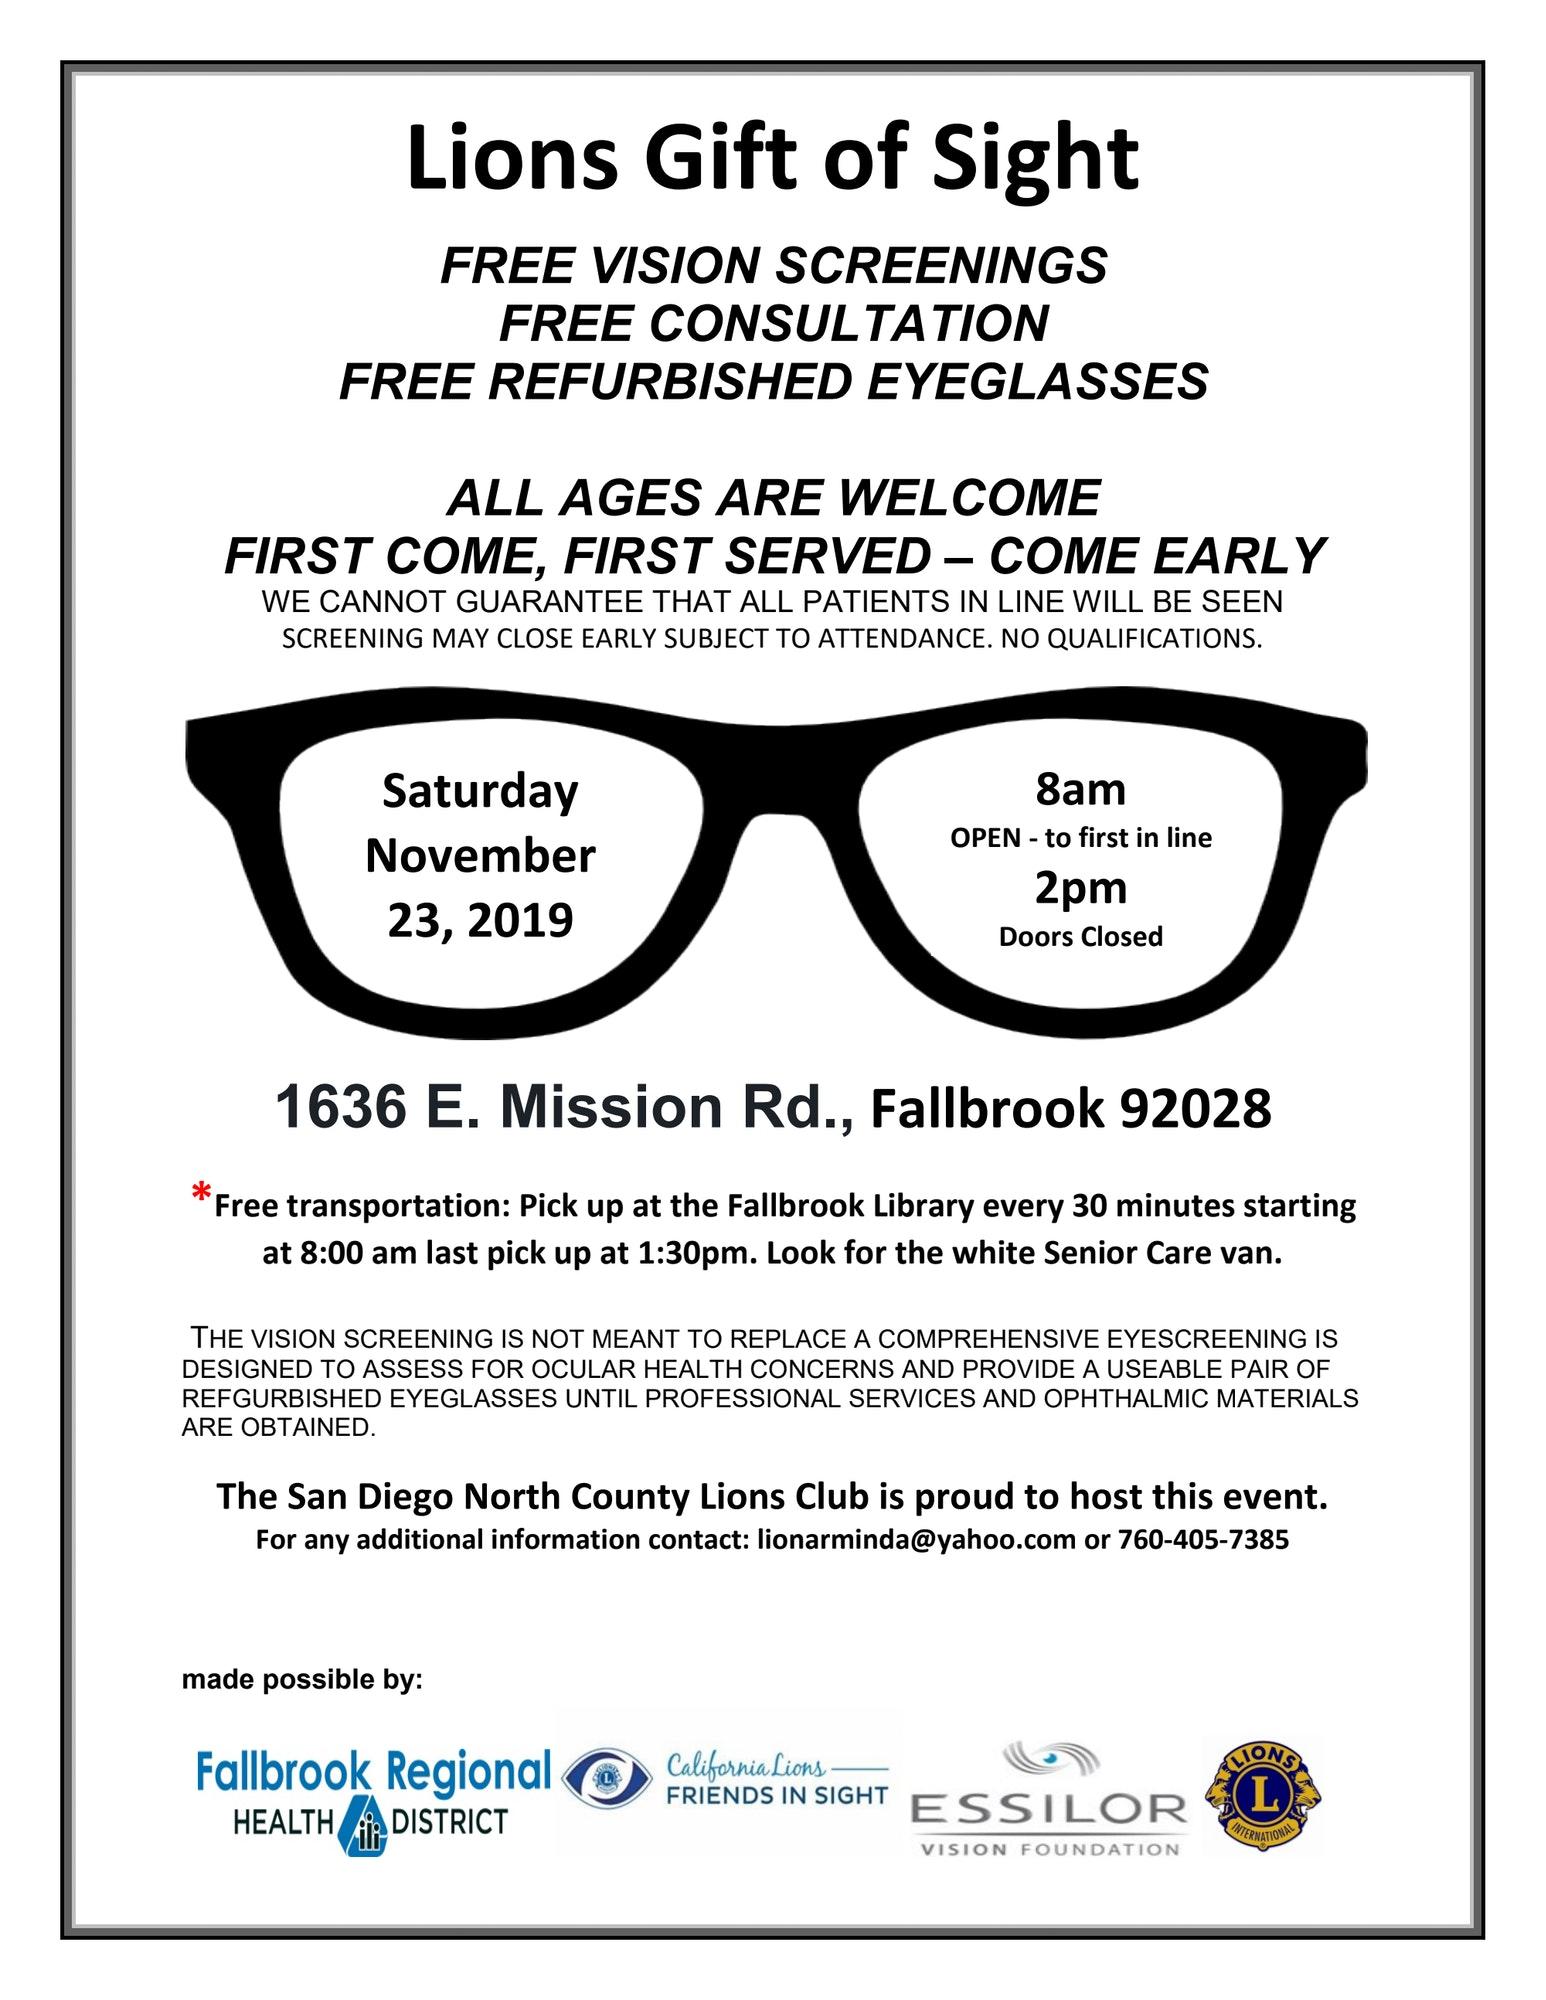 Free vision exam and refurbished glasses. Saturday, November 23, 8am-2pm. 1636 E. Mission Rd., Fallbrook